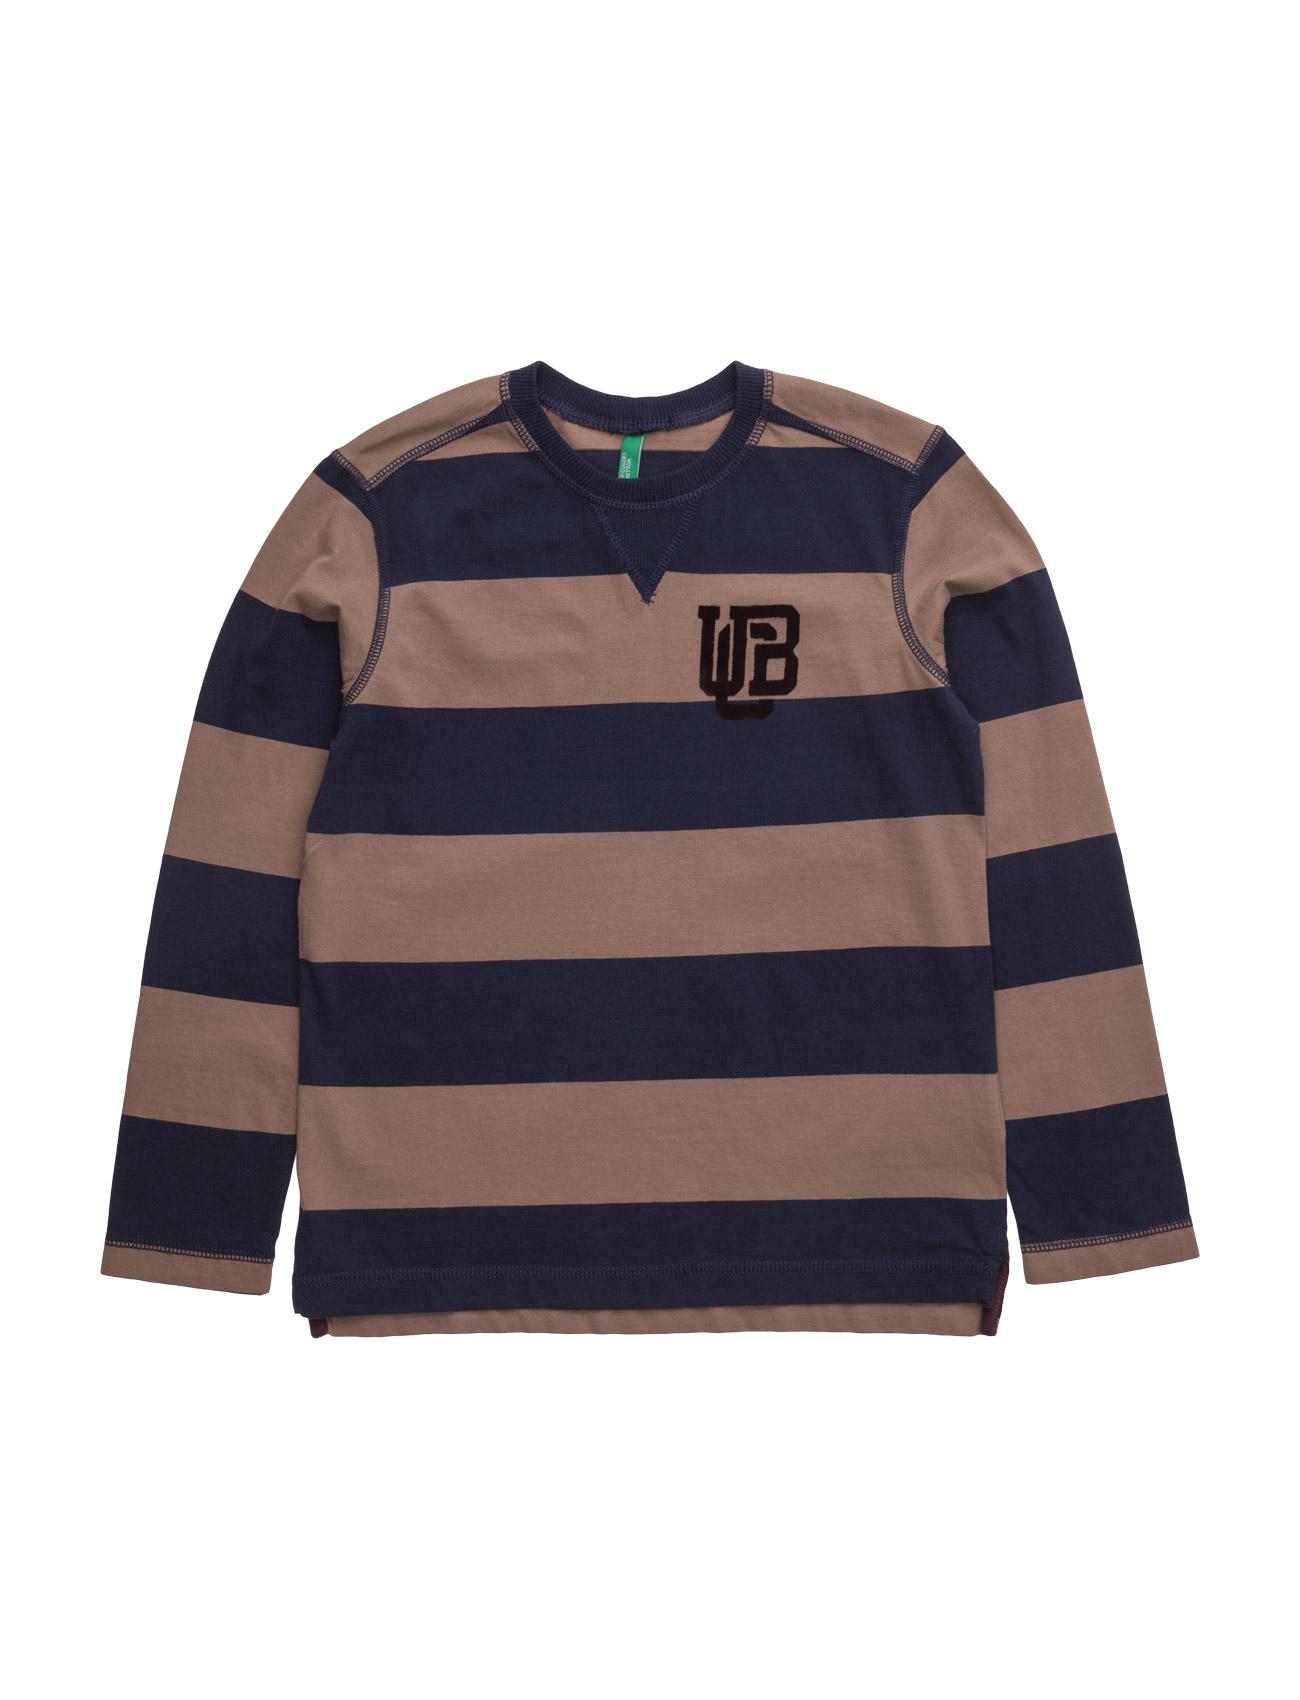 T-Shirt L/S United Colors of Benetton Pullovers til Drenge i